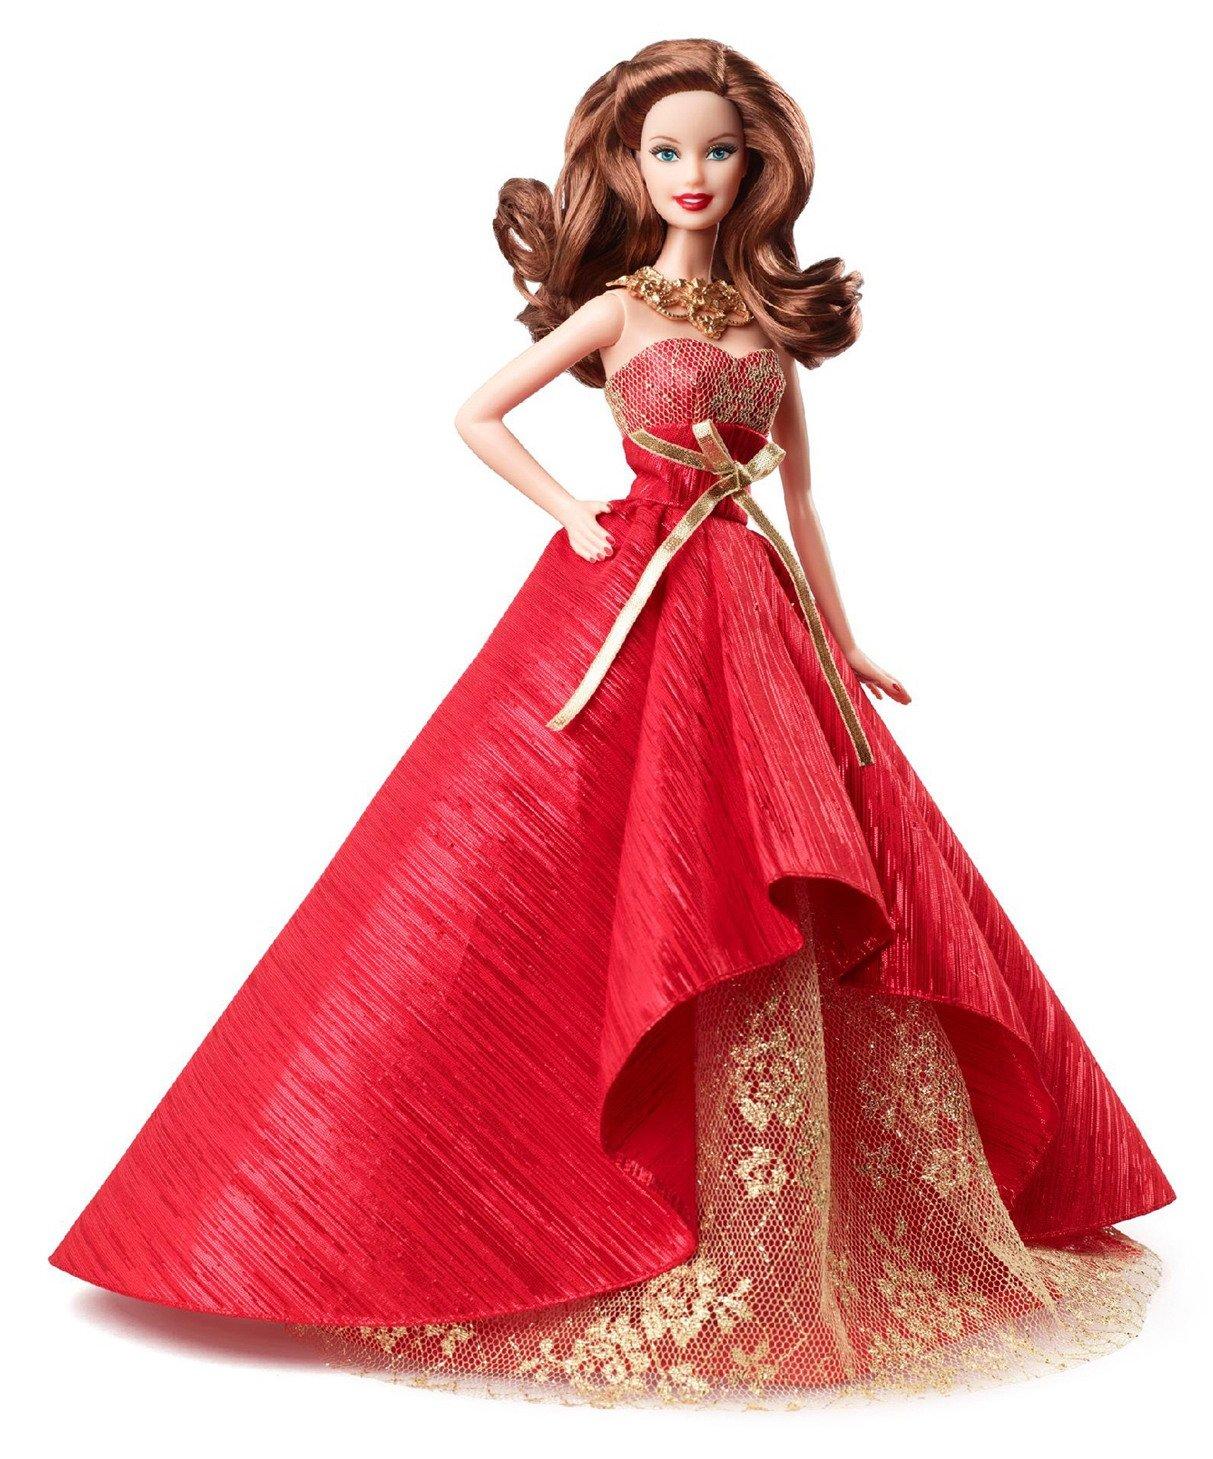 Barbie Collector 2014 Holiday Doll Brunette online kaufen